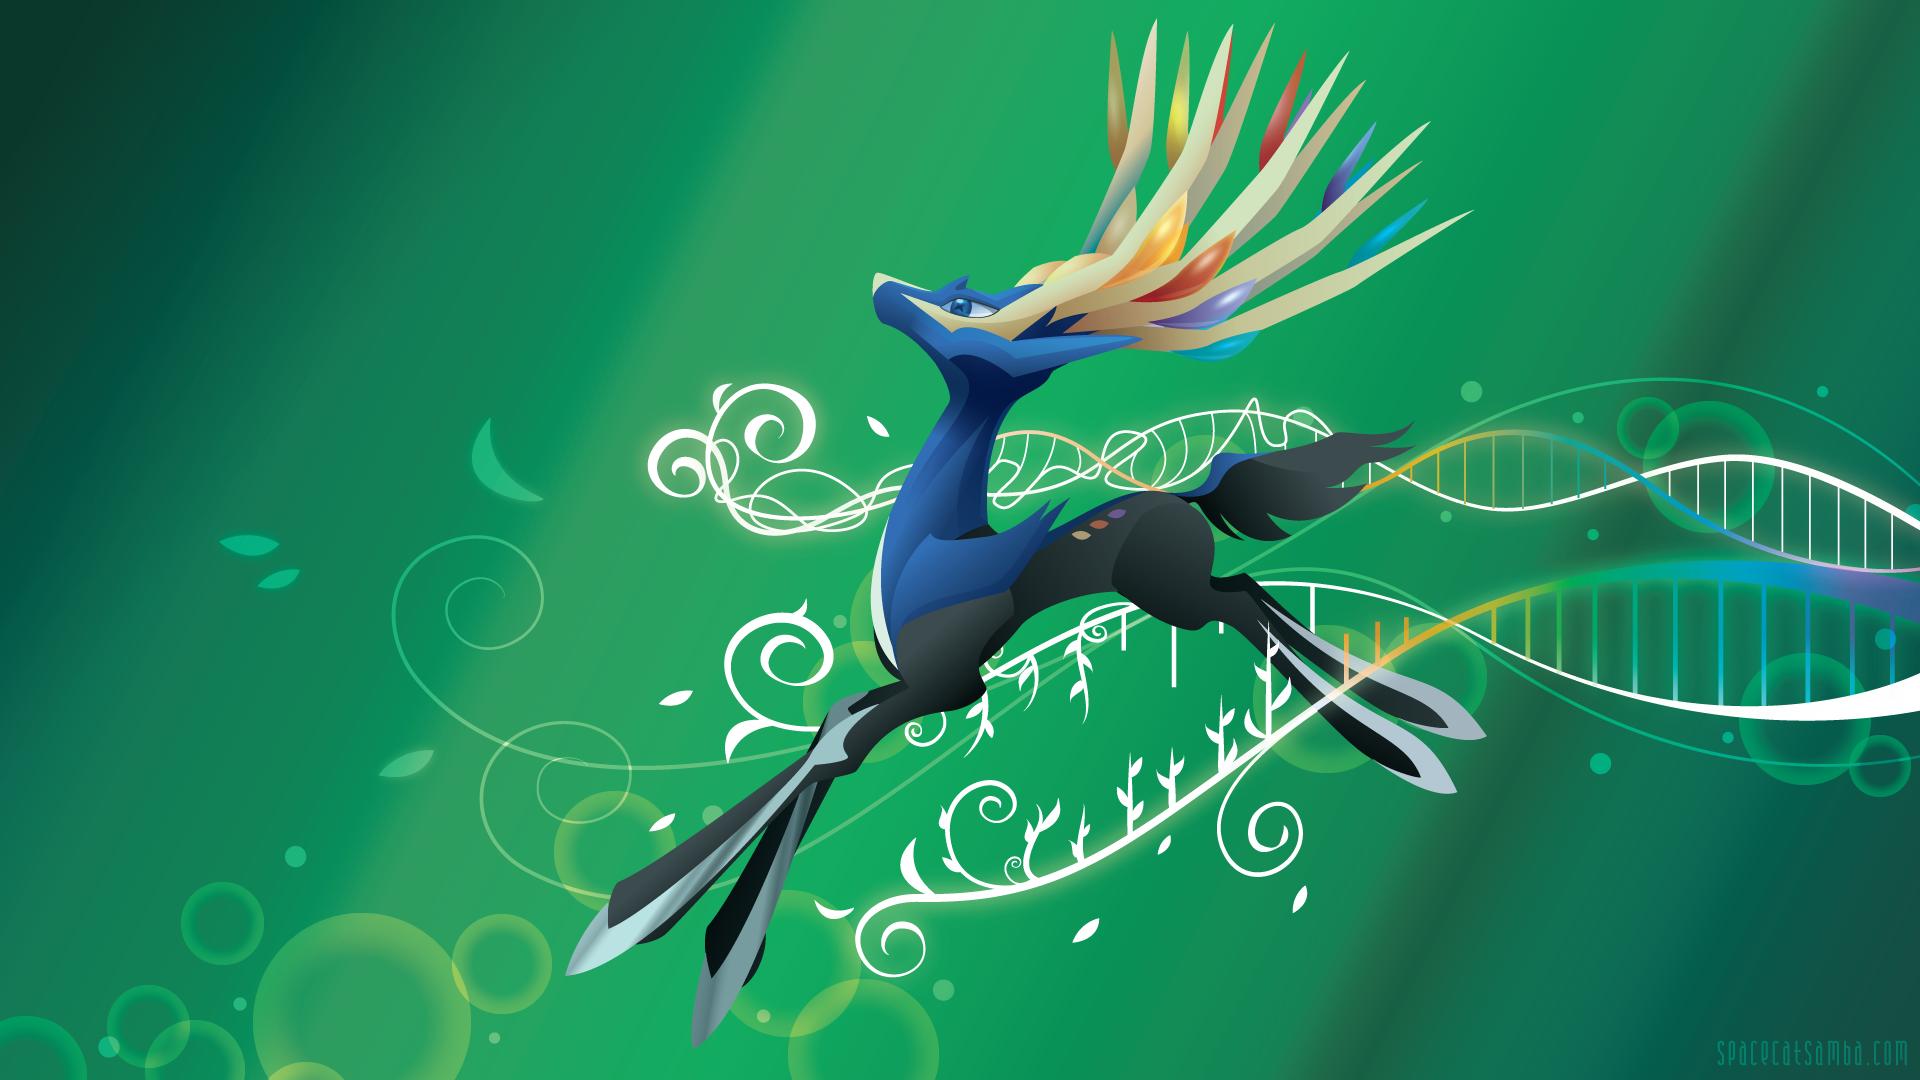 Pokemon Yveltal And Xerneas Wallpaper | www.imgkid.com ...